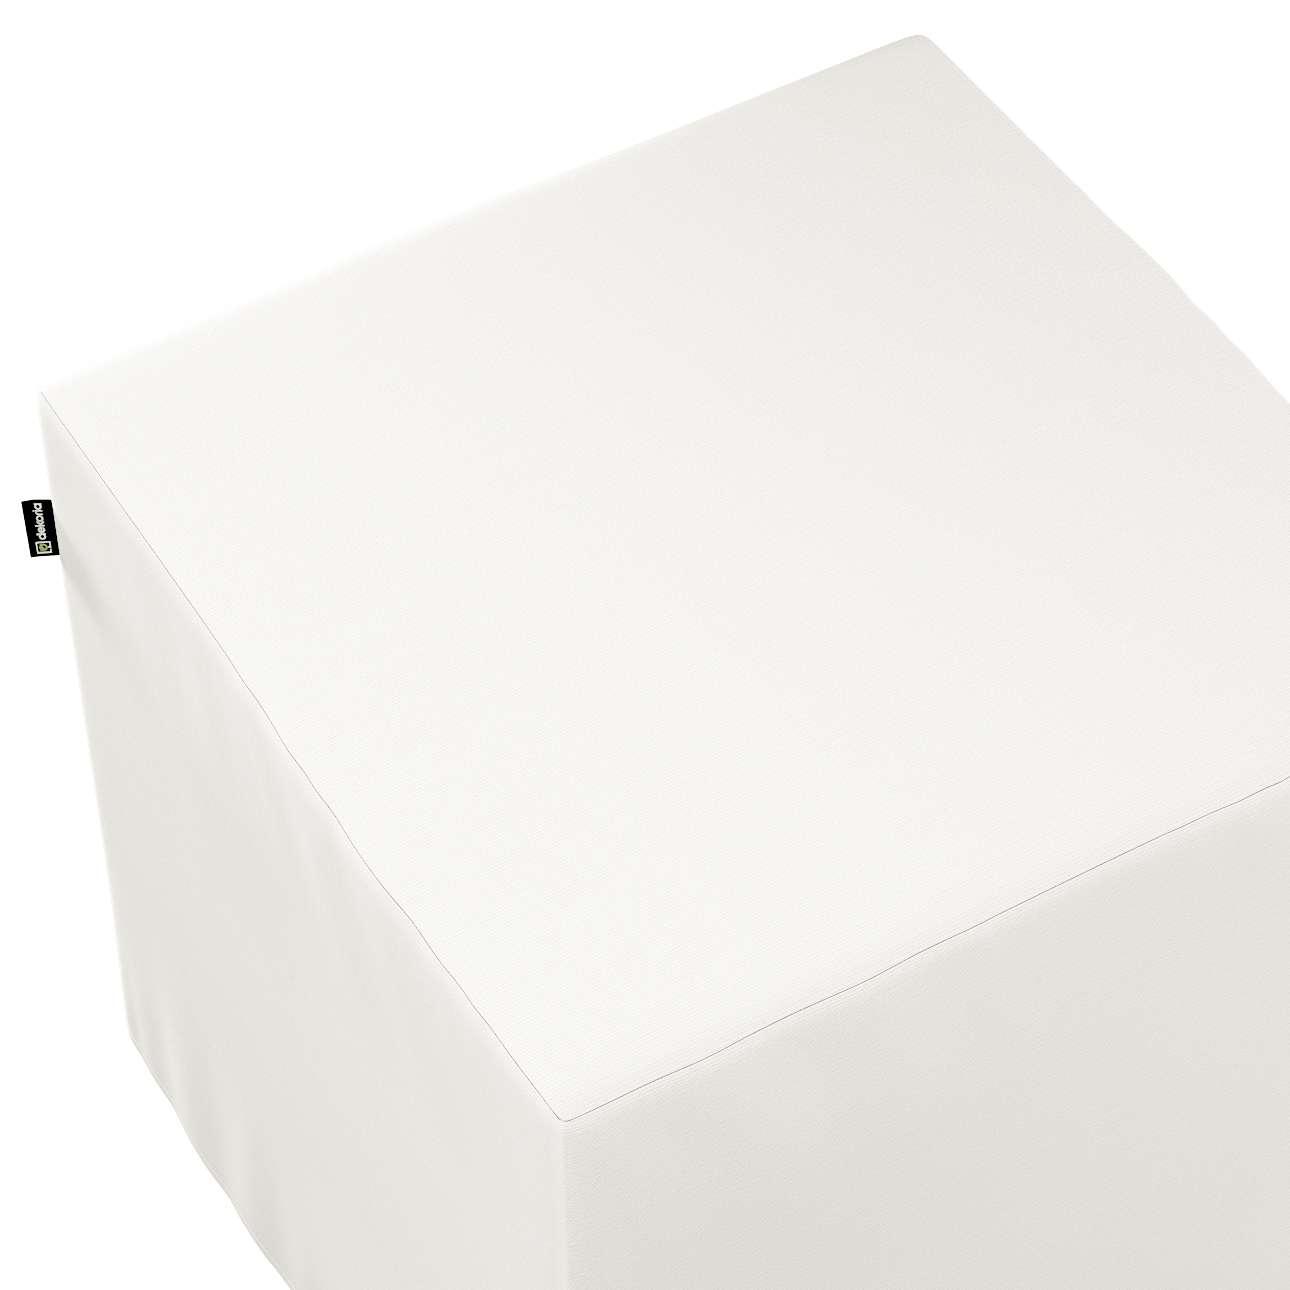 Pufa kostka w kolekcji Cotton Panama, tkanina: 702-34